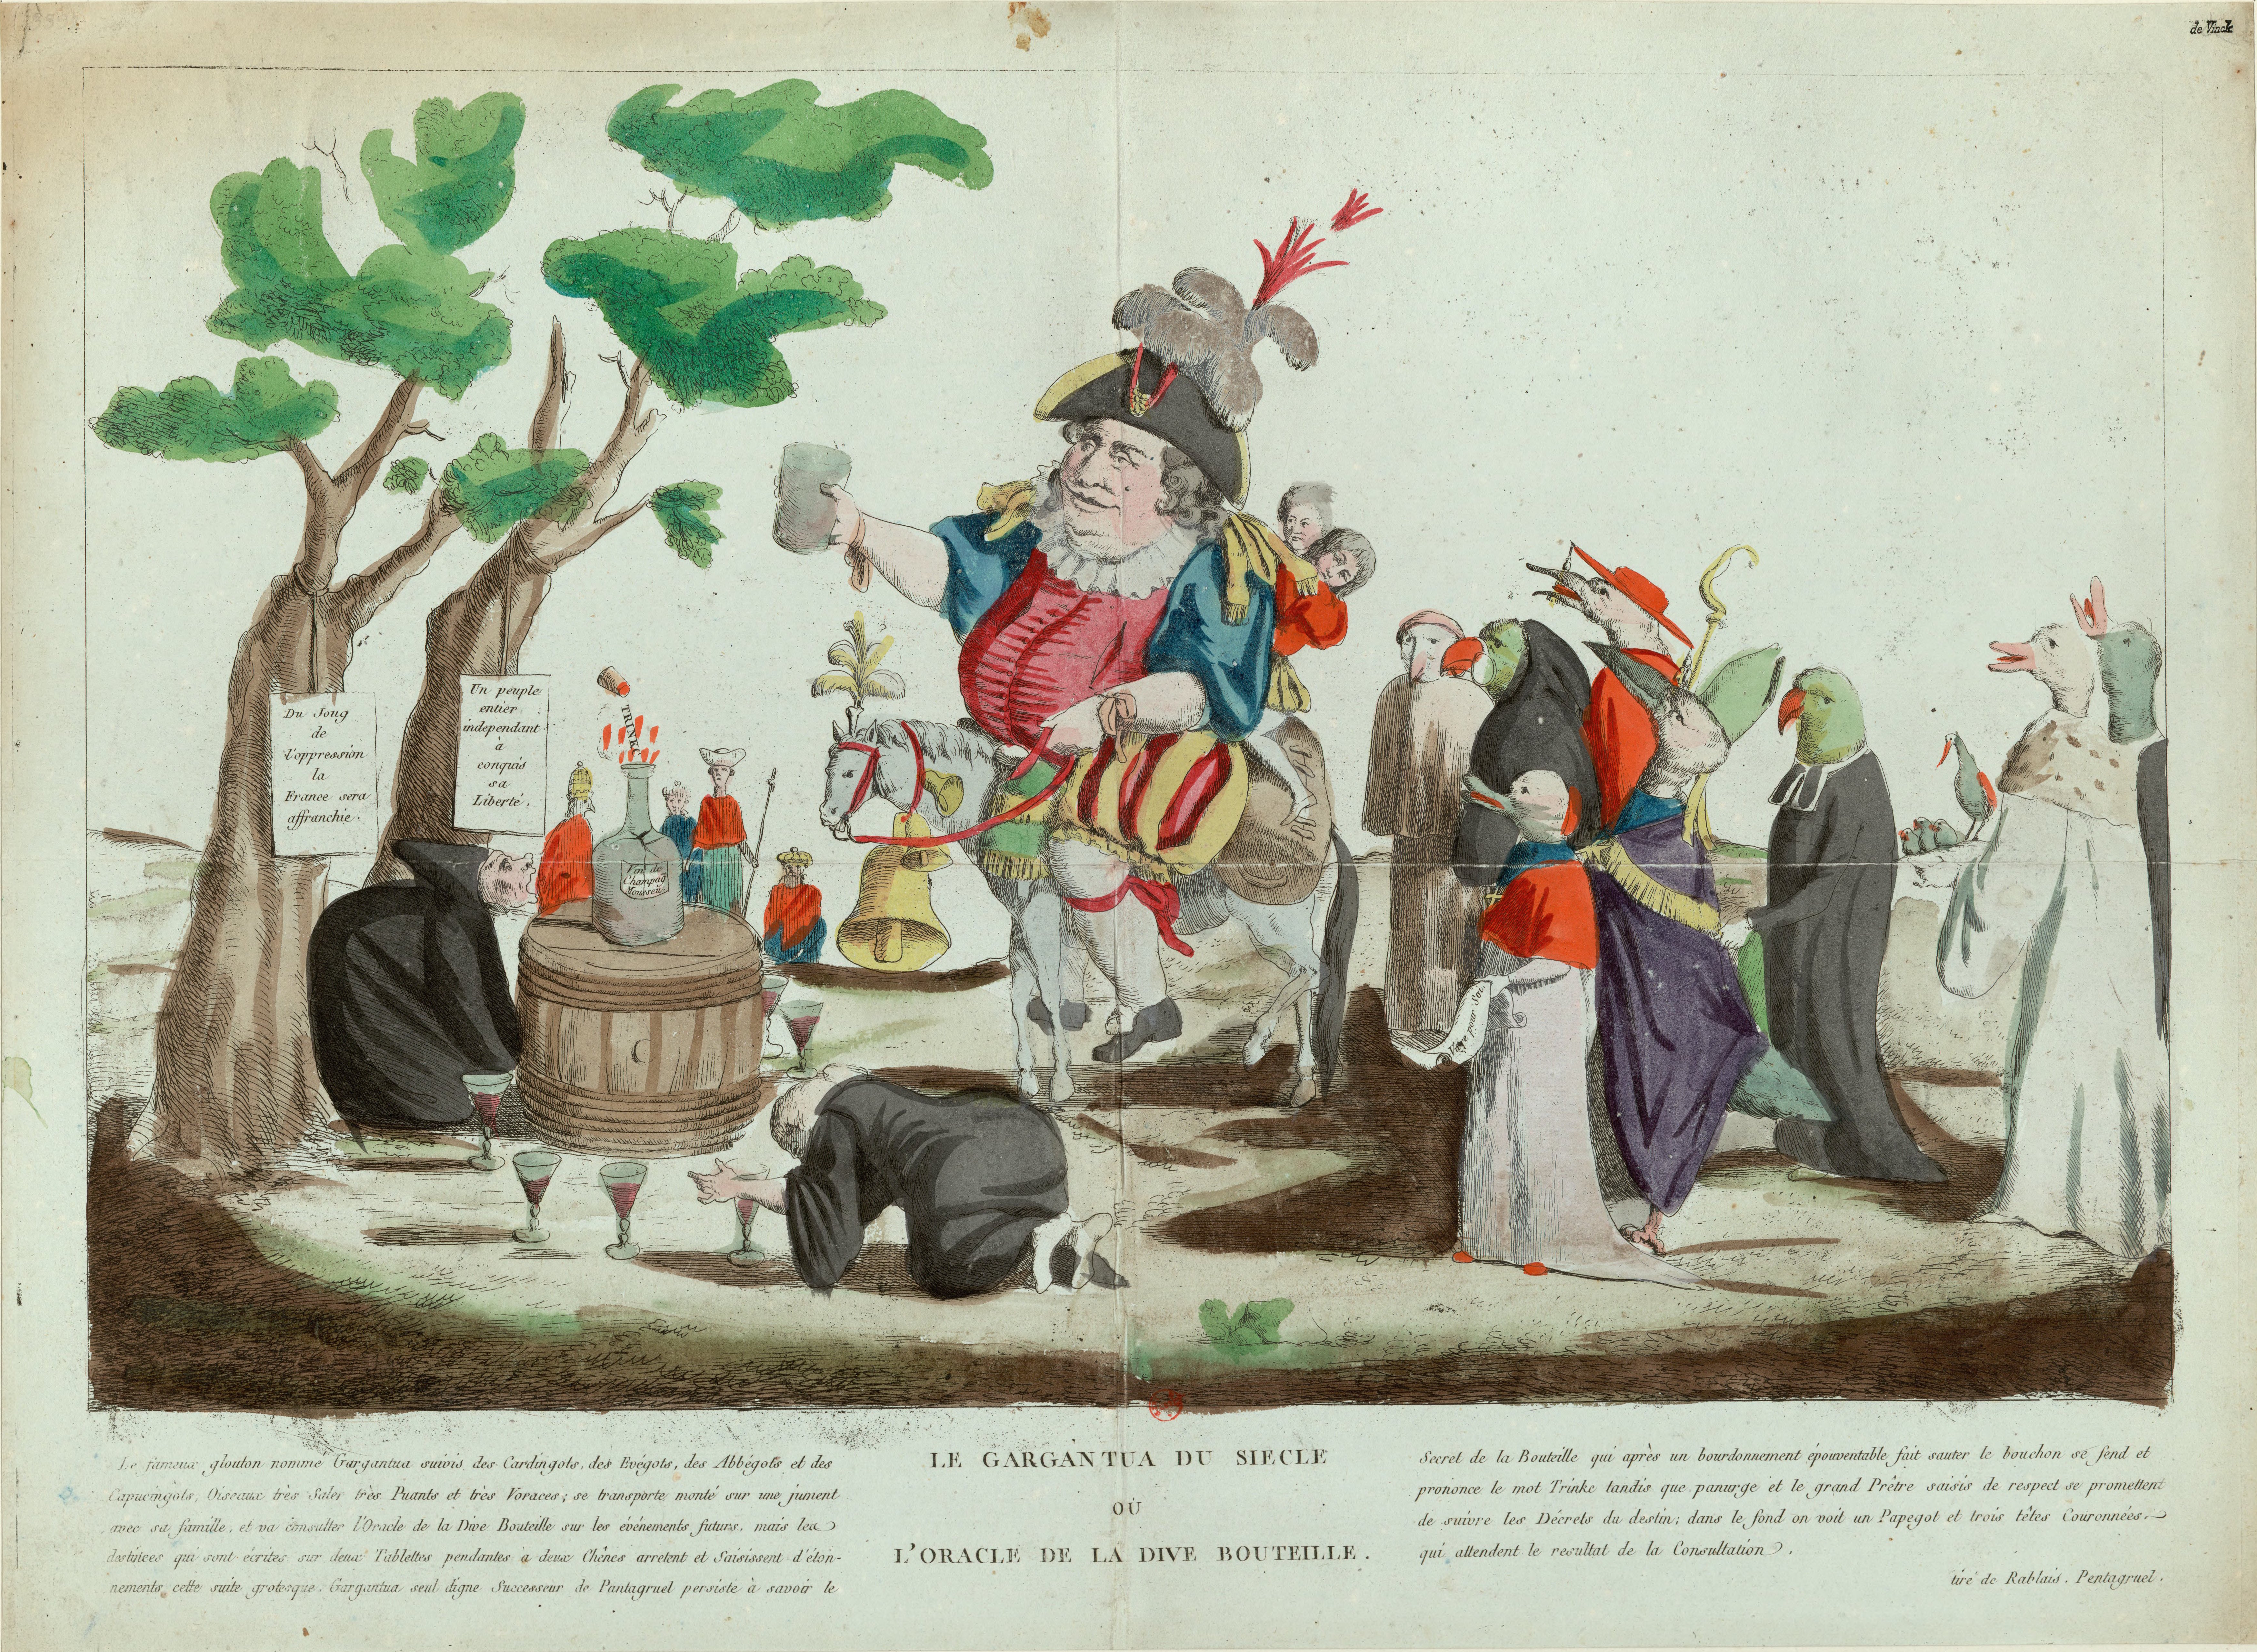 Engraving portraying King Louis XVI as a drunkard